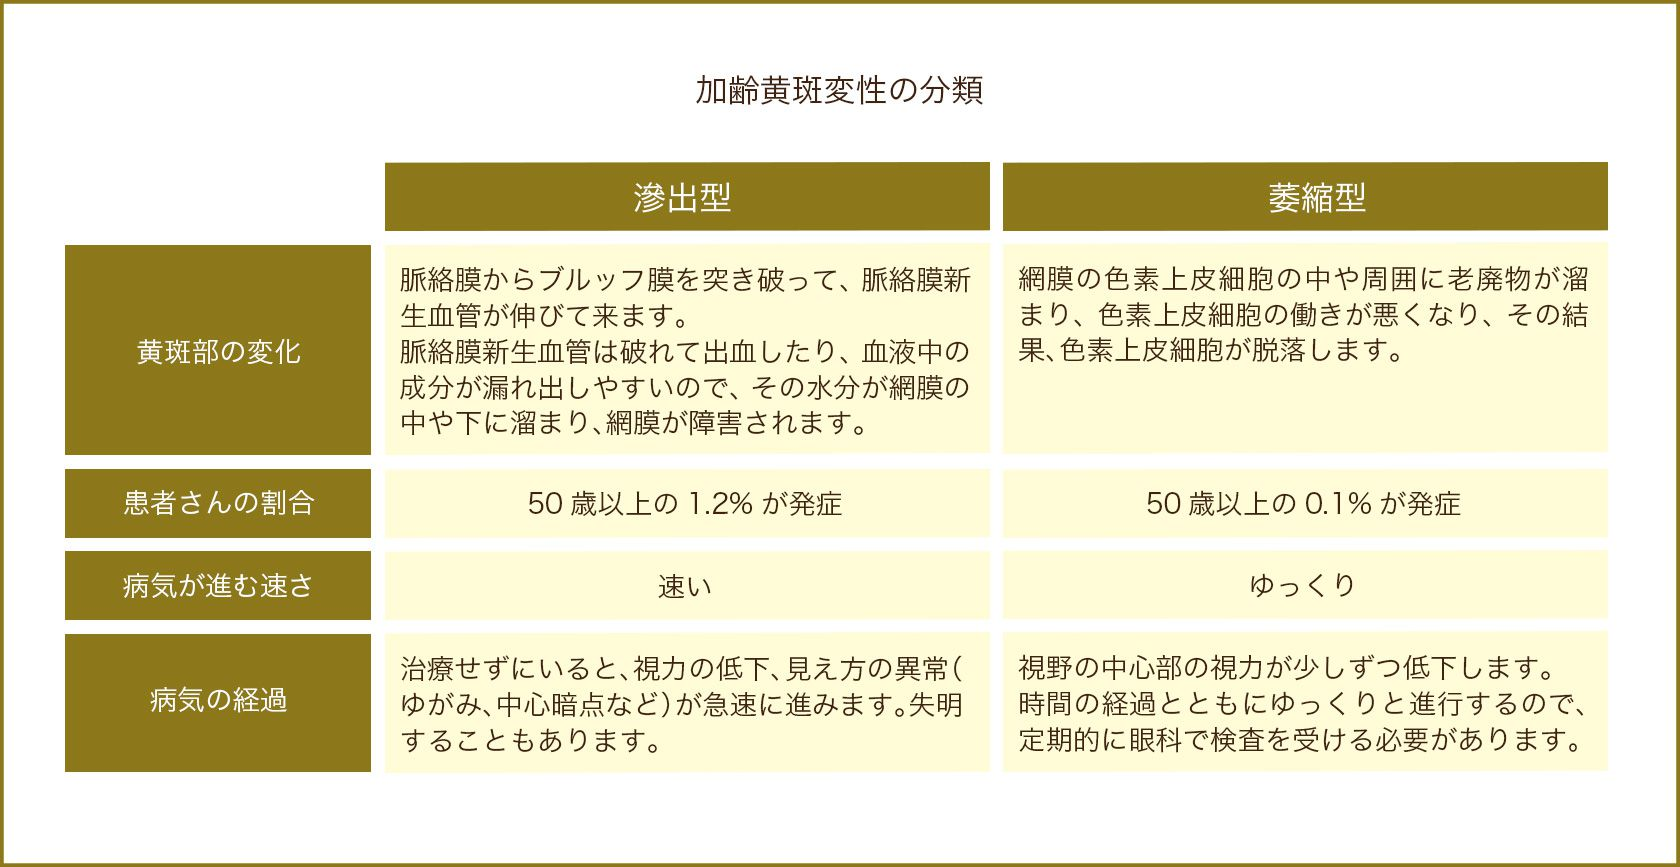 加齢黄斑変性の分類